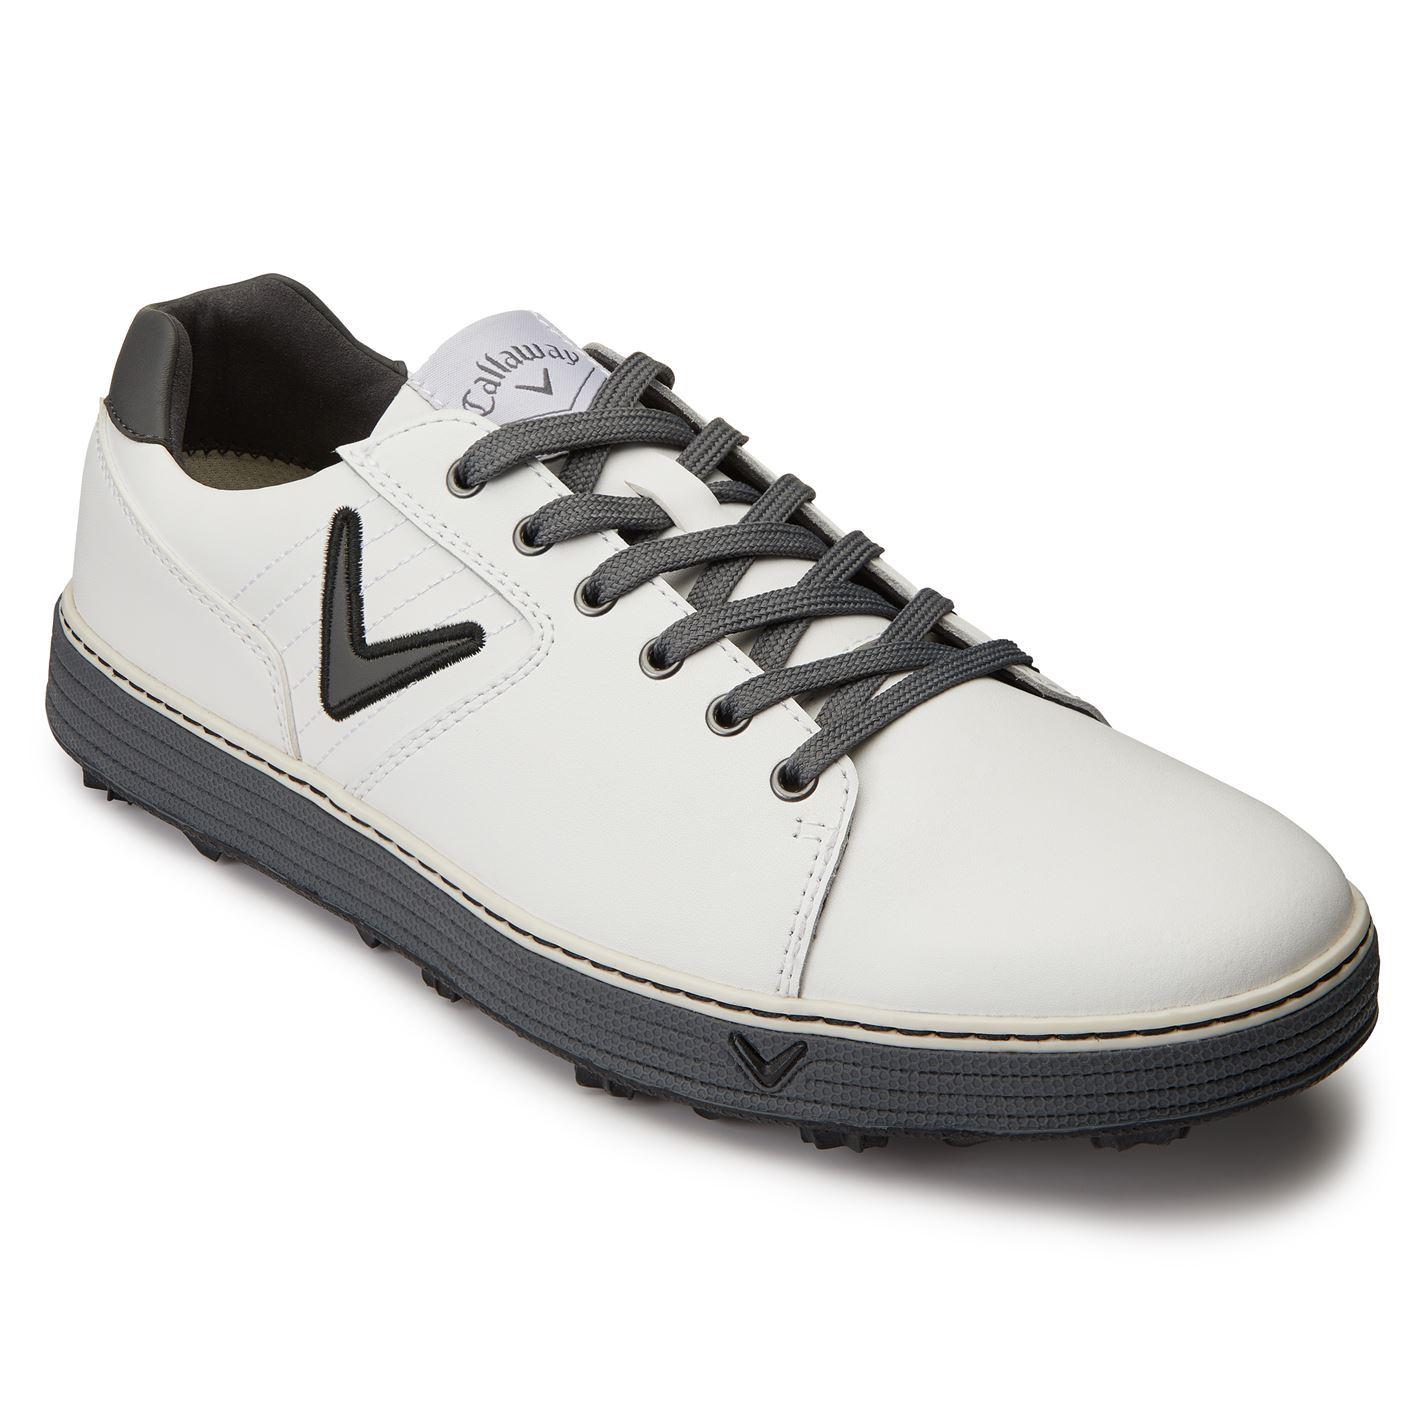 Callaway-Delmar-Urban-Golf-Shoes-Mens-Spikeless-Footwear thumbnail 16